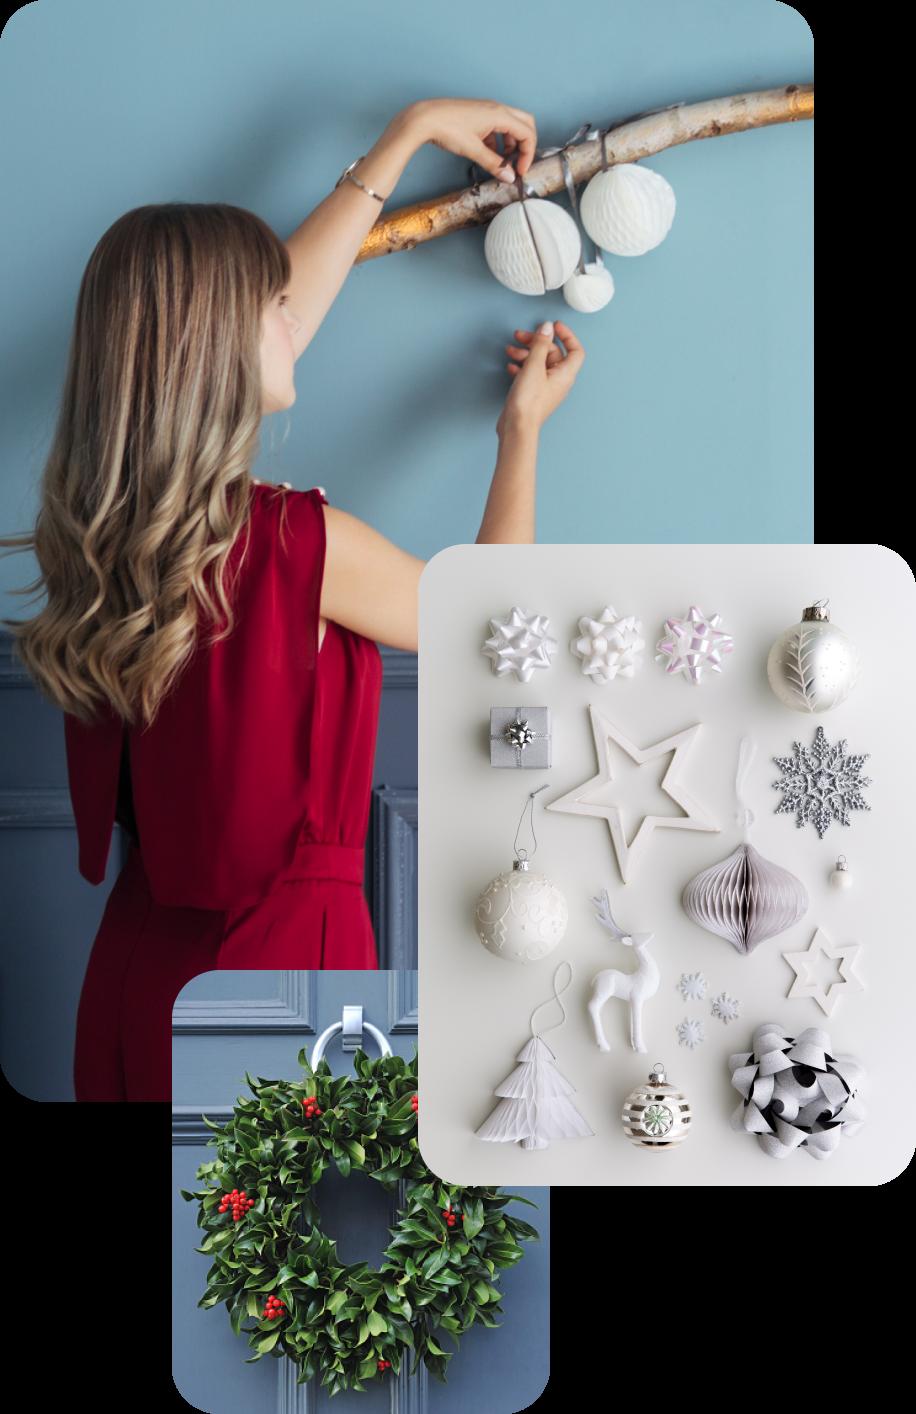 A women hanging ornaments